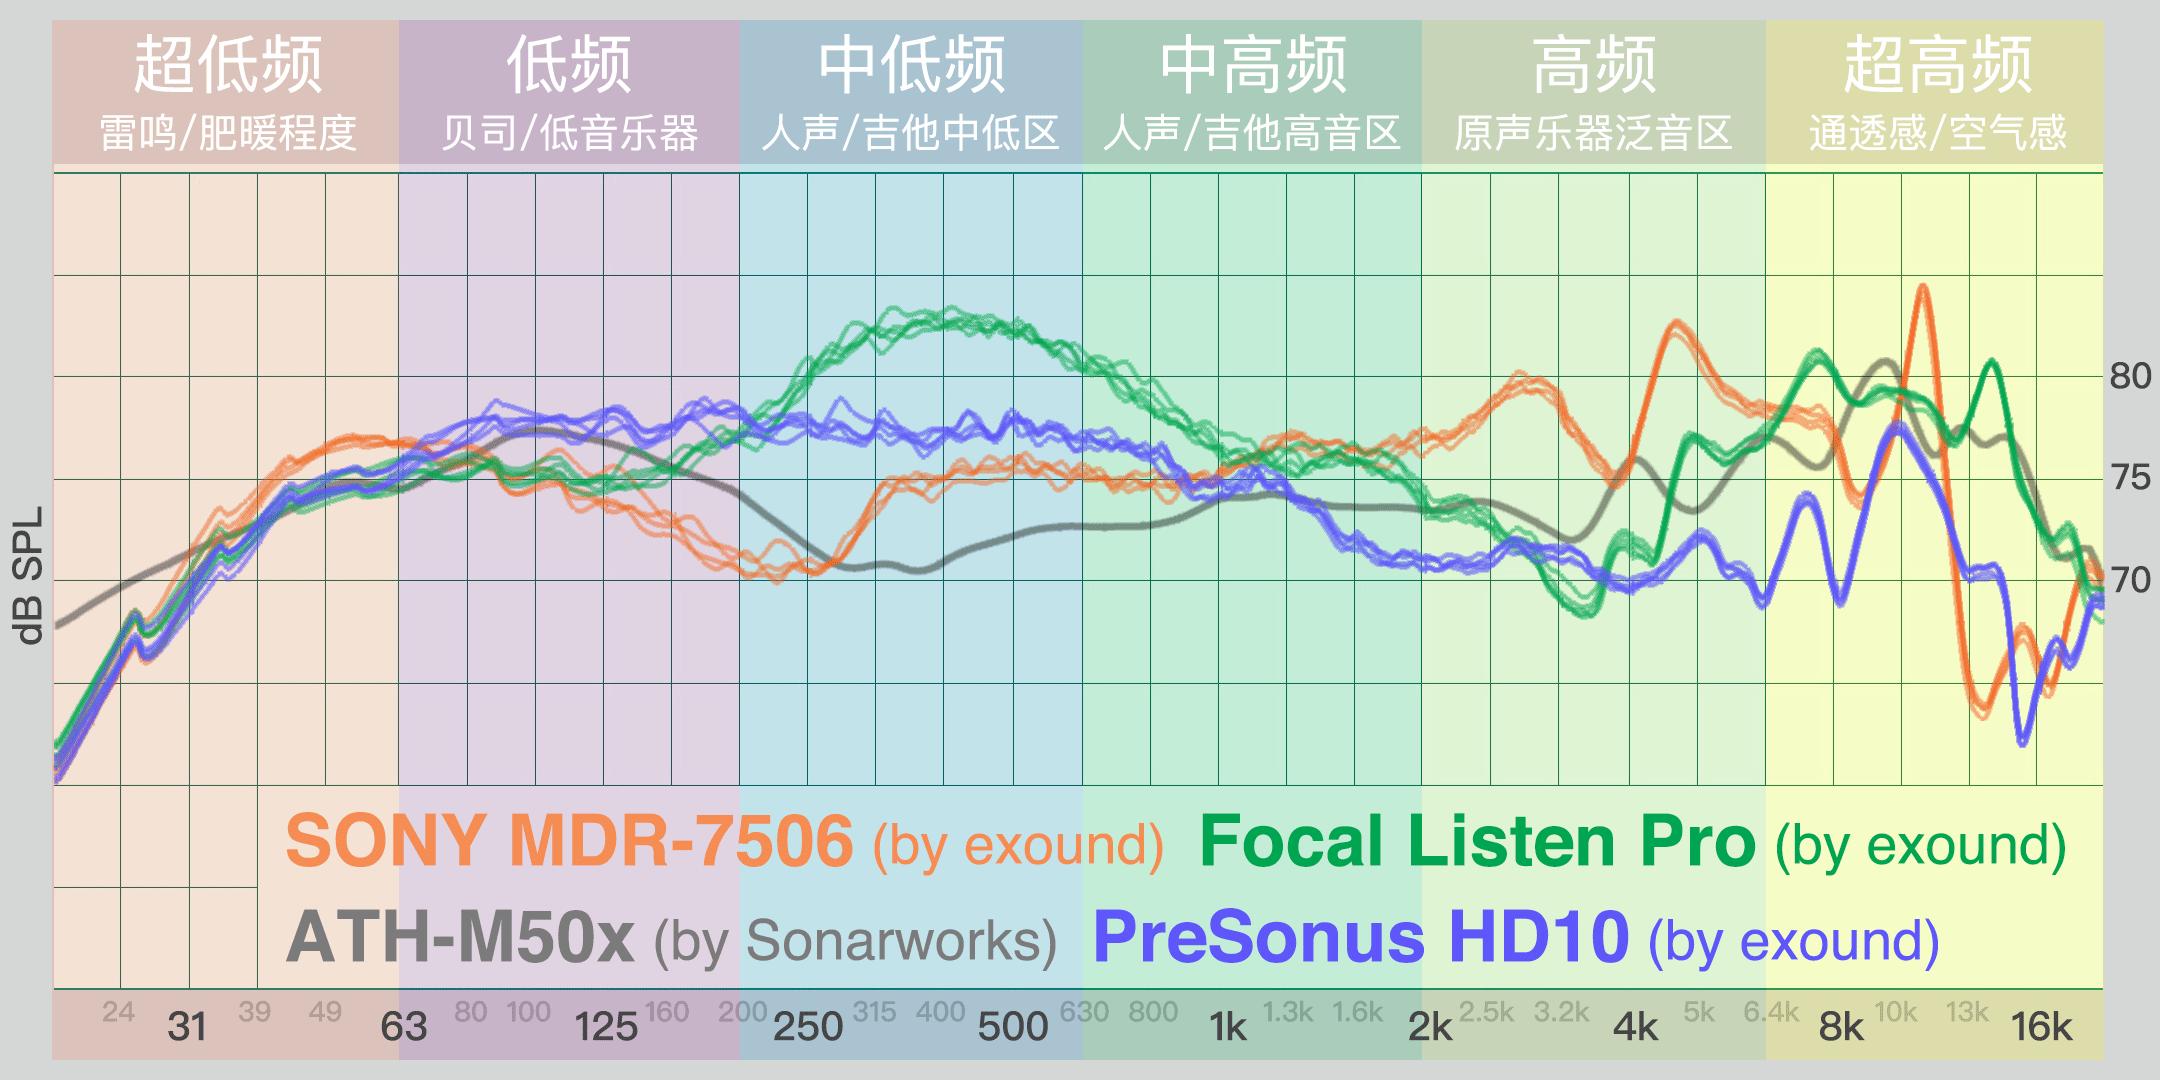 PreSonus_HD10BT_21.png